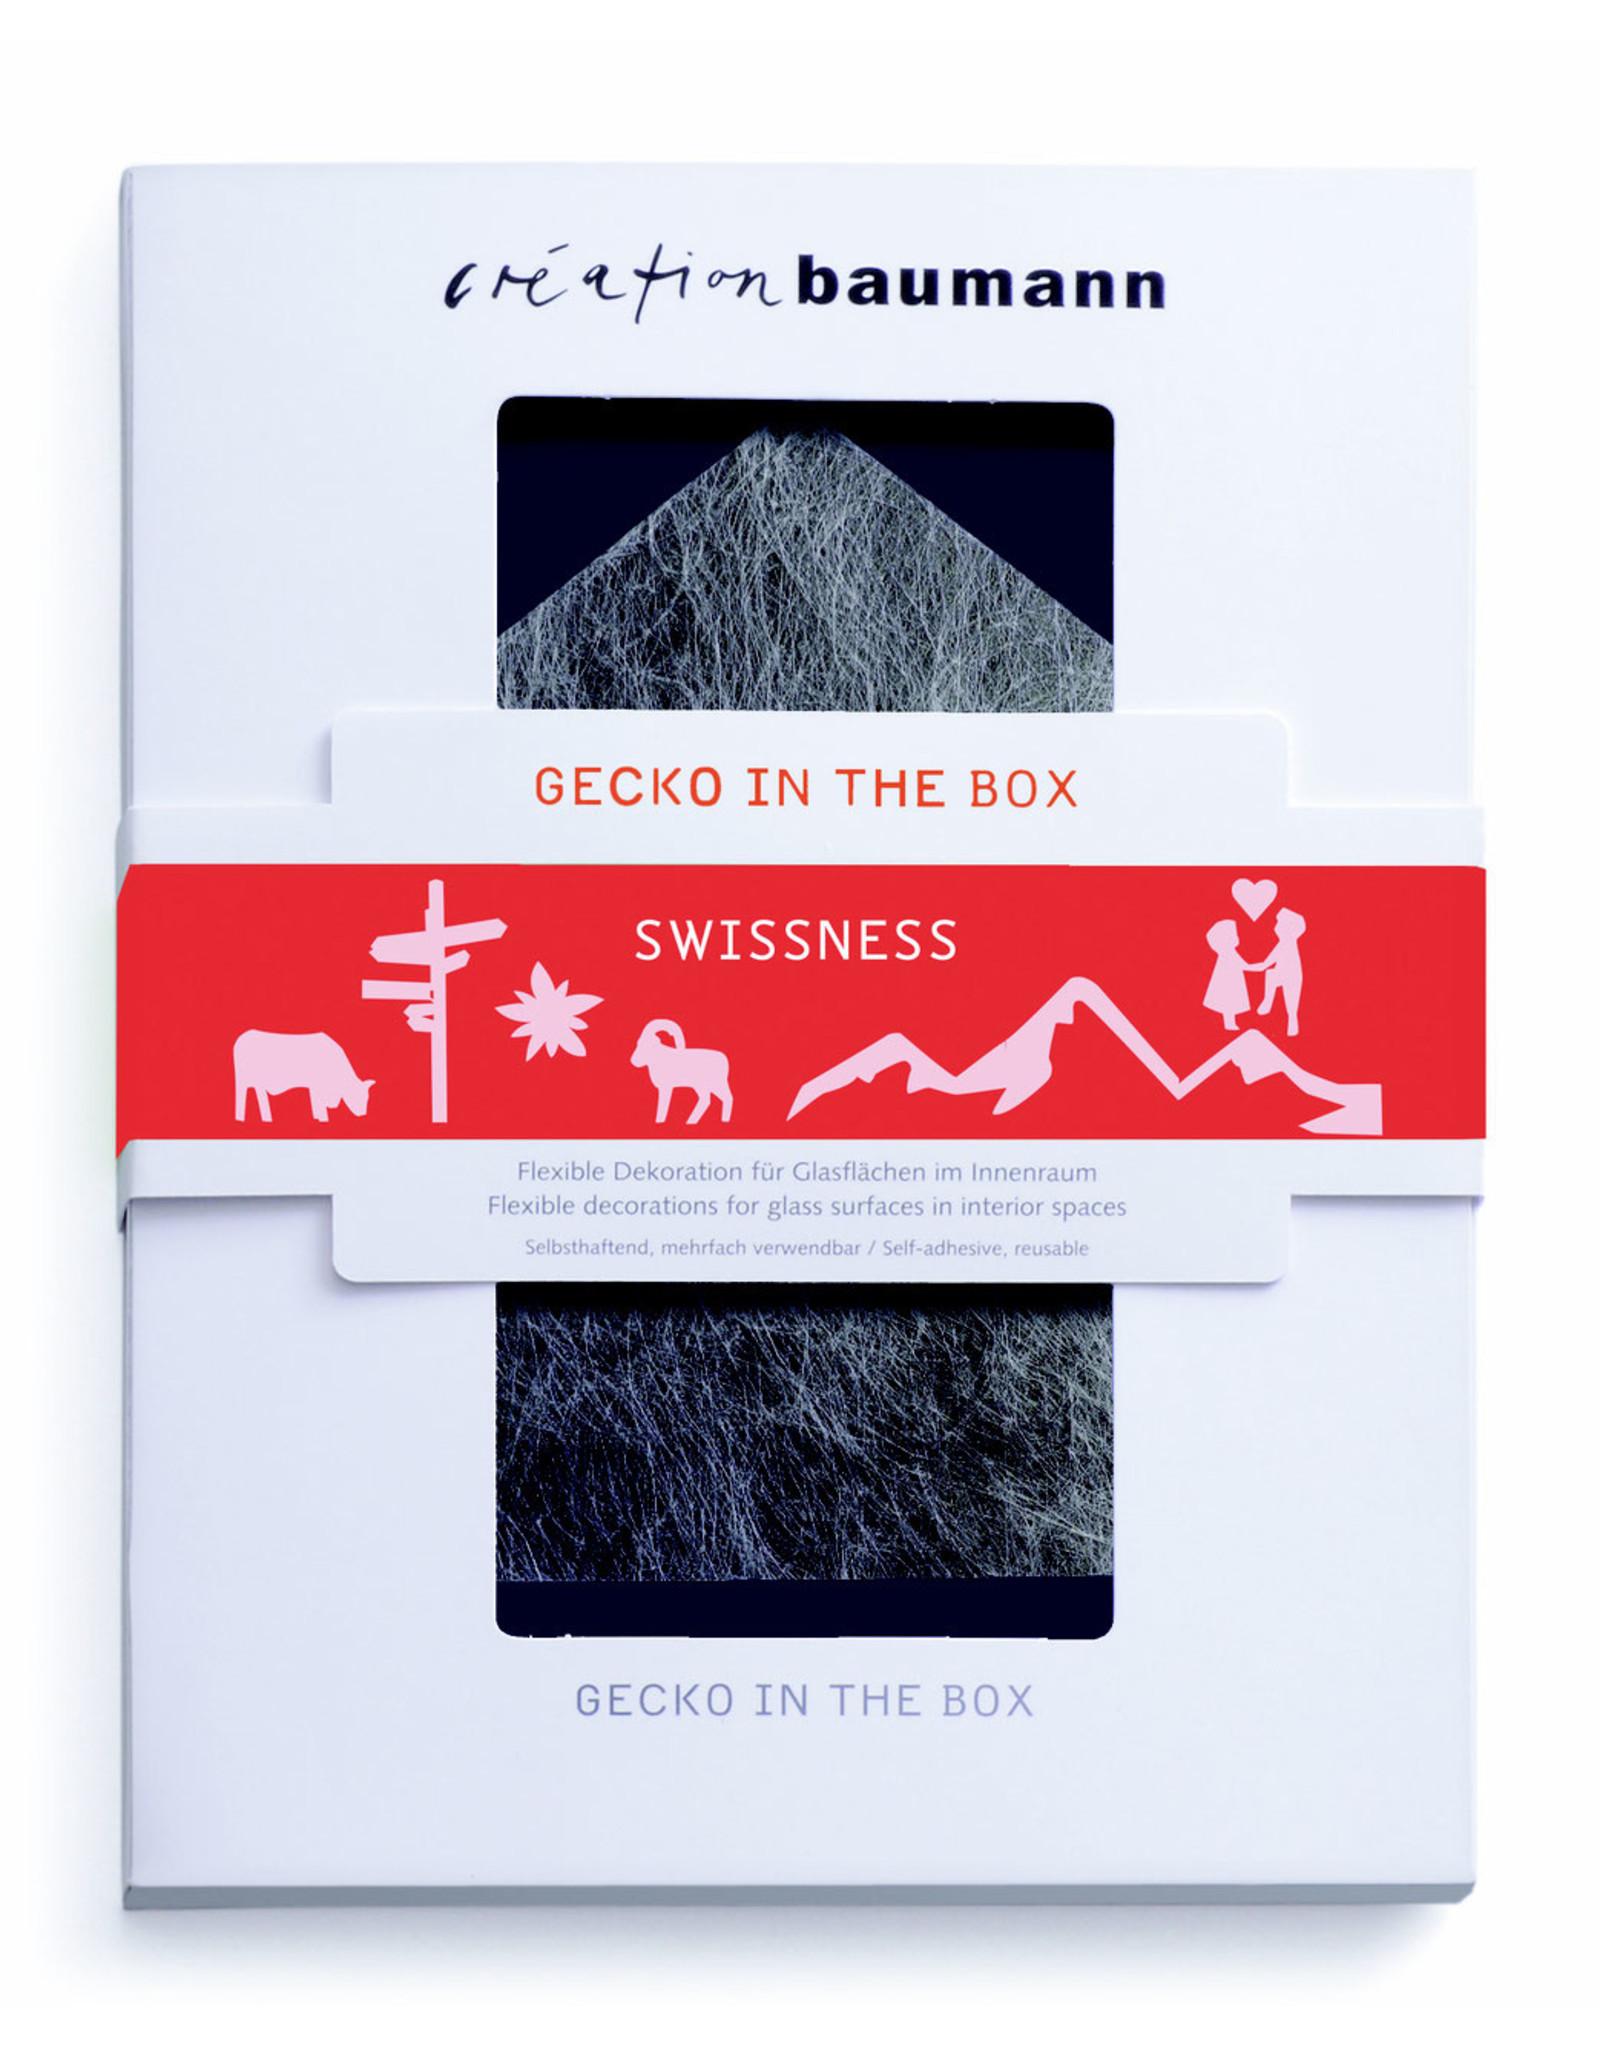 Création Baumann Gecko in the Box Swissness